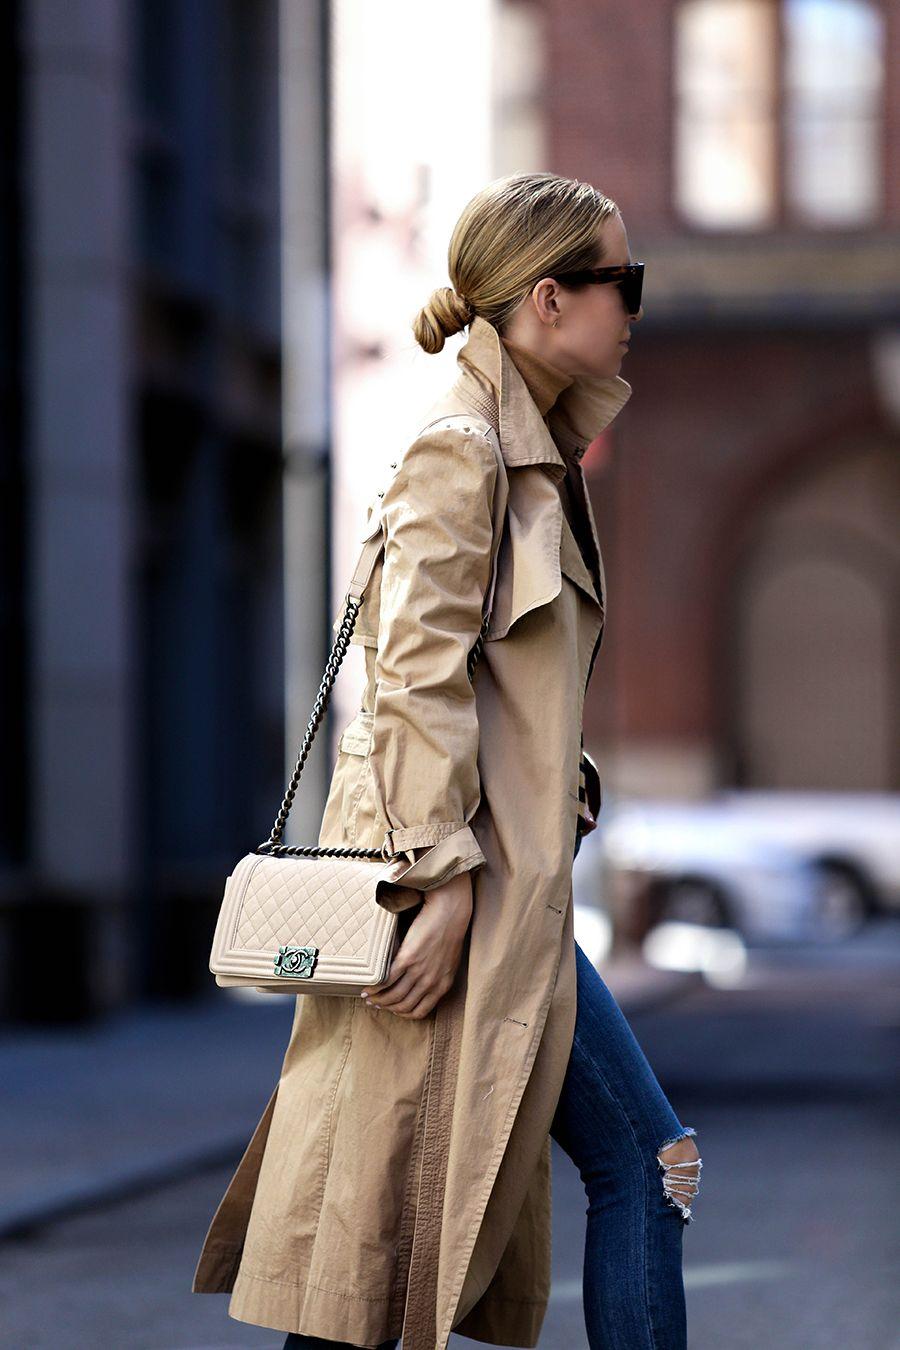 Helena Glazer of Brooklyn Blonde wearing a trench coat by La Vie Rebecca Taylor